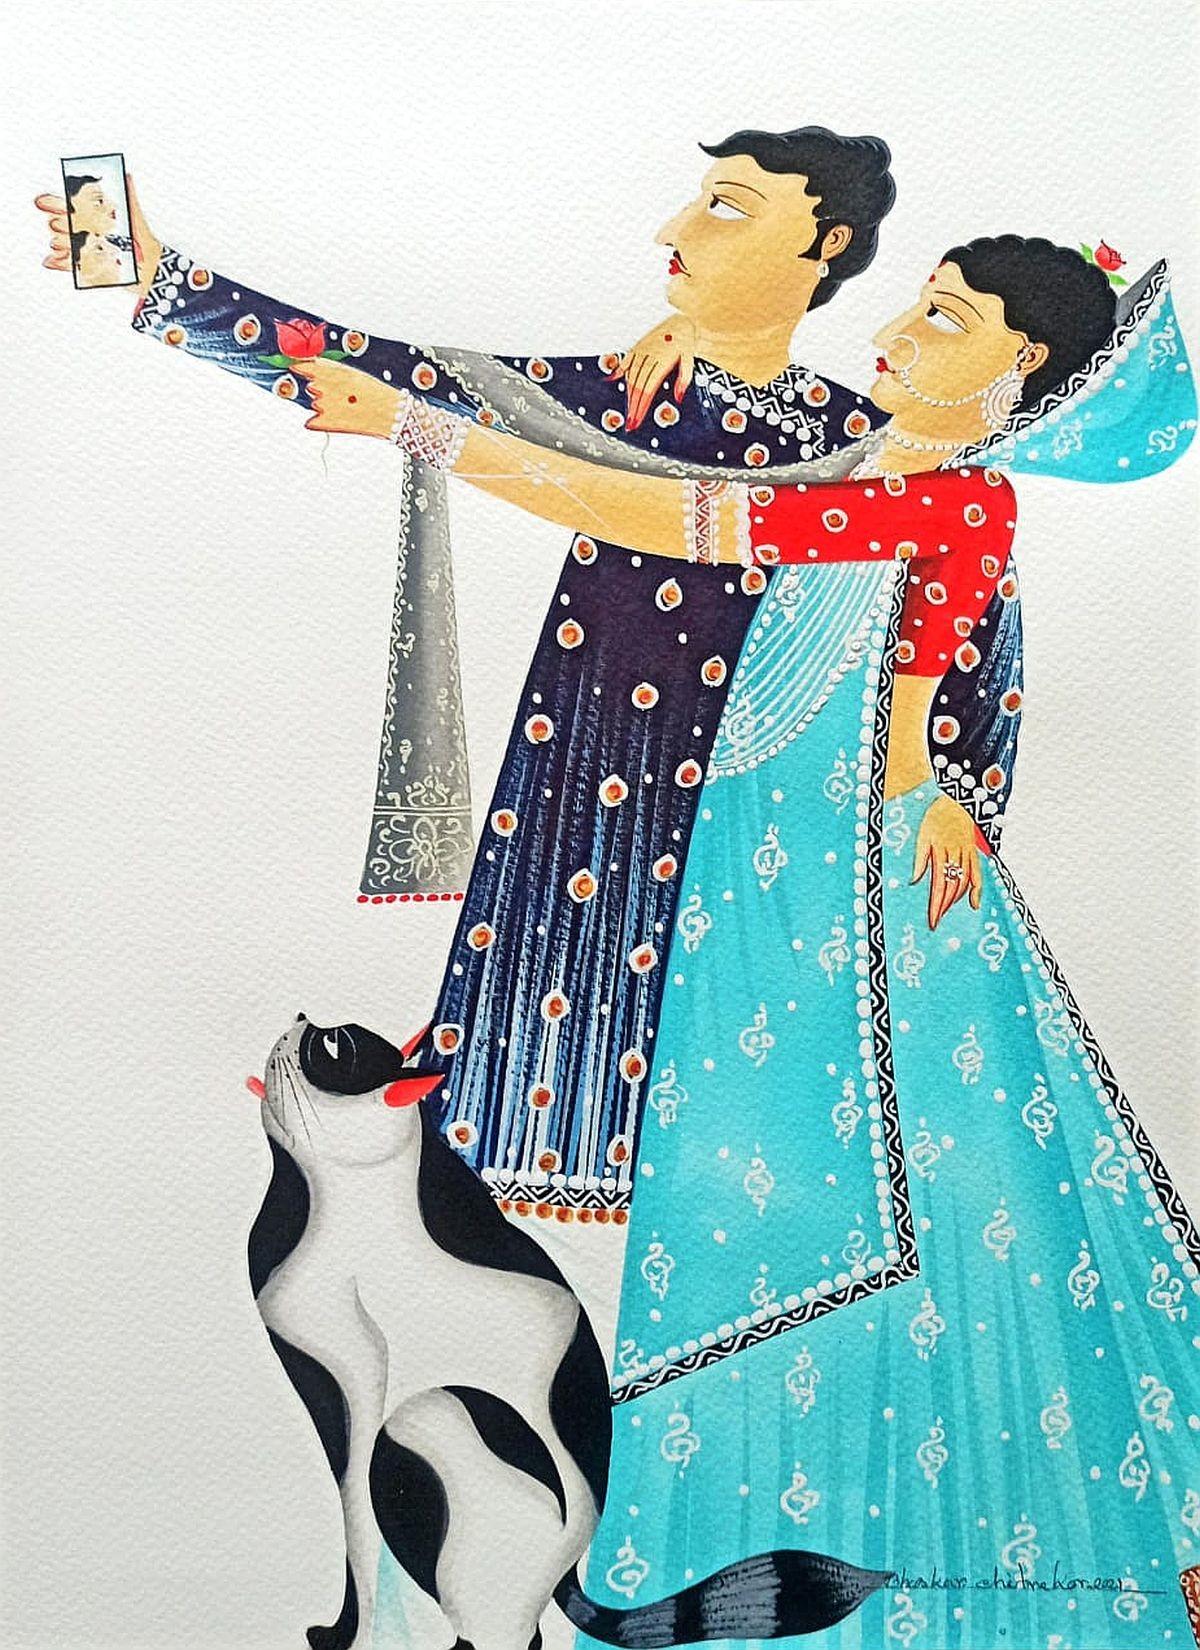 Babu-Bibi taking 'selfie' with Cat by Bhaskar Chitrakar, Folk Painting, Natural colours on paper, Silver color